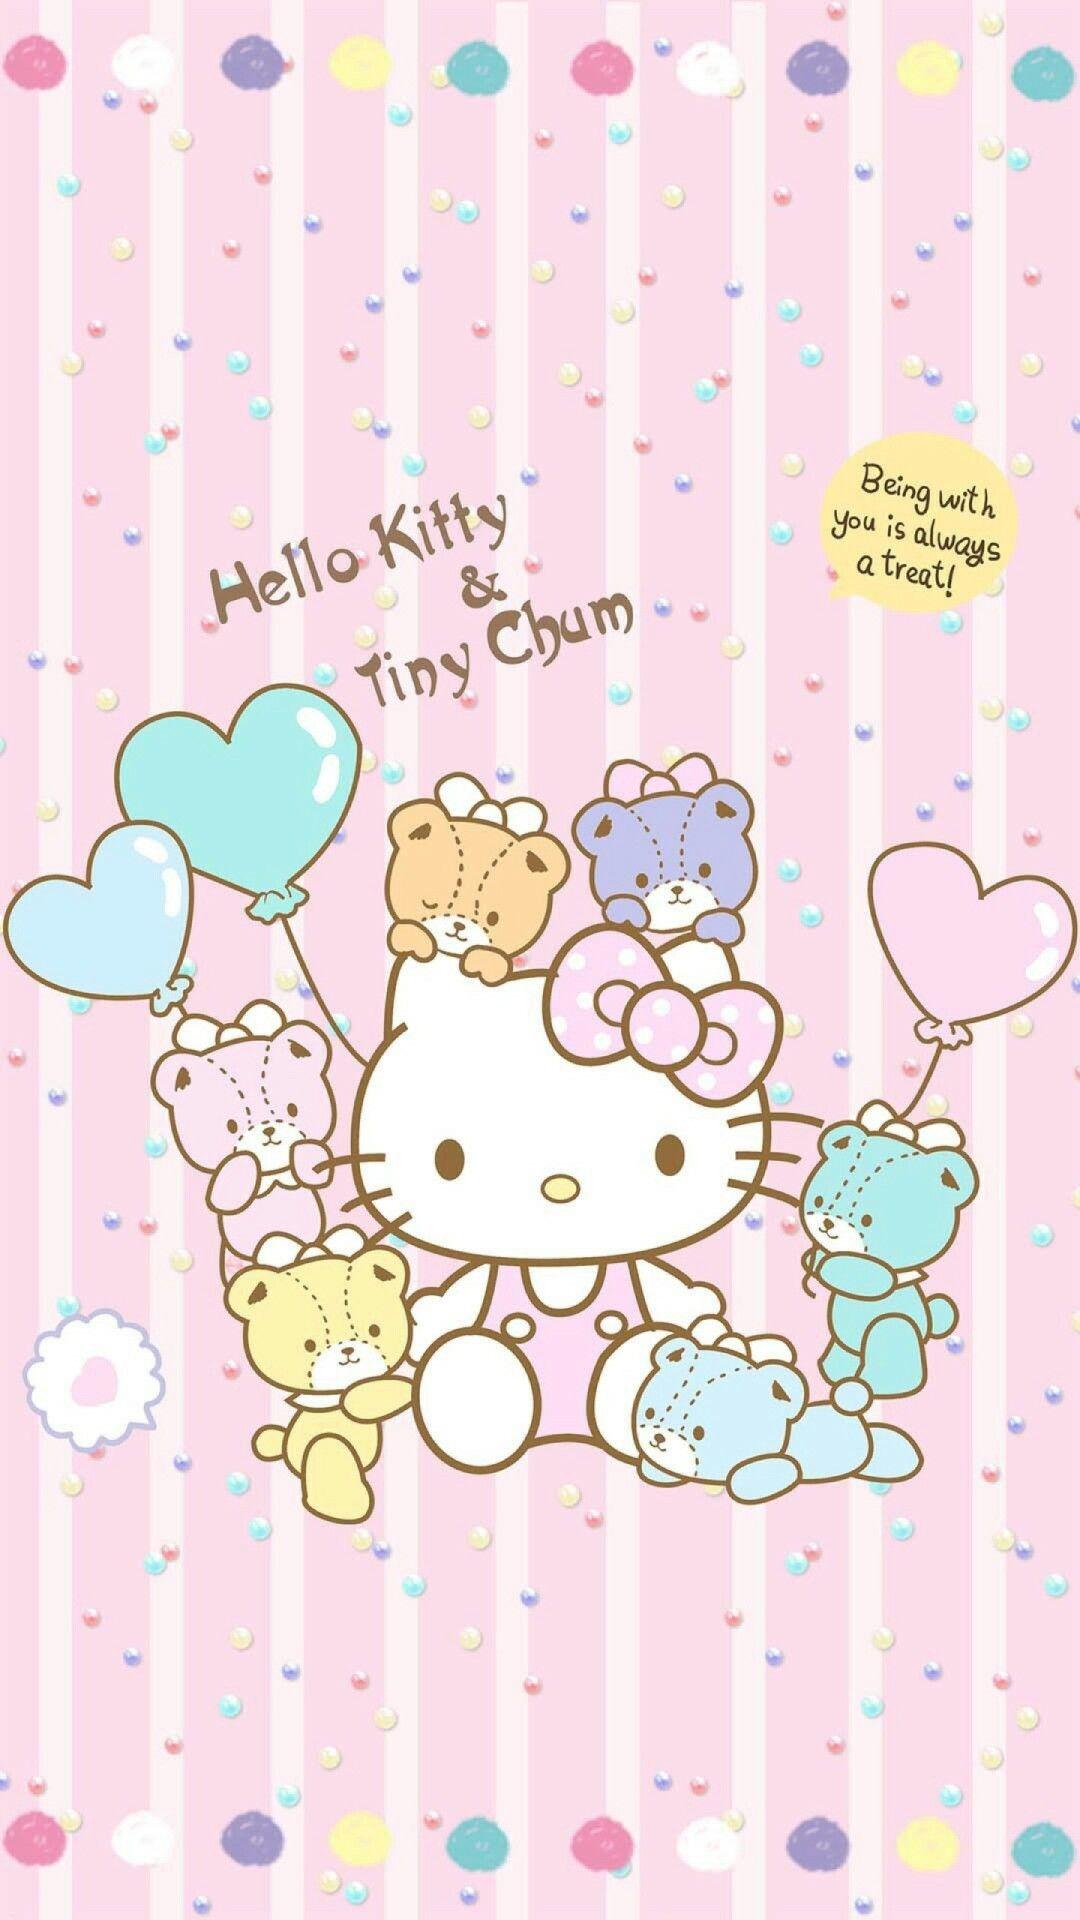 Beautiful Wallpaper Hello Kitty Kawaii - 38e8586036489c44afdc537df9627aa5  Collection_159498.jpg